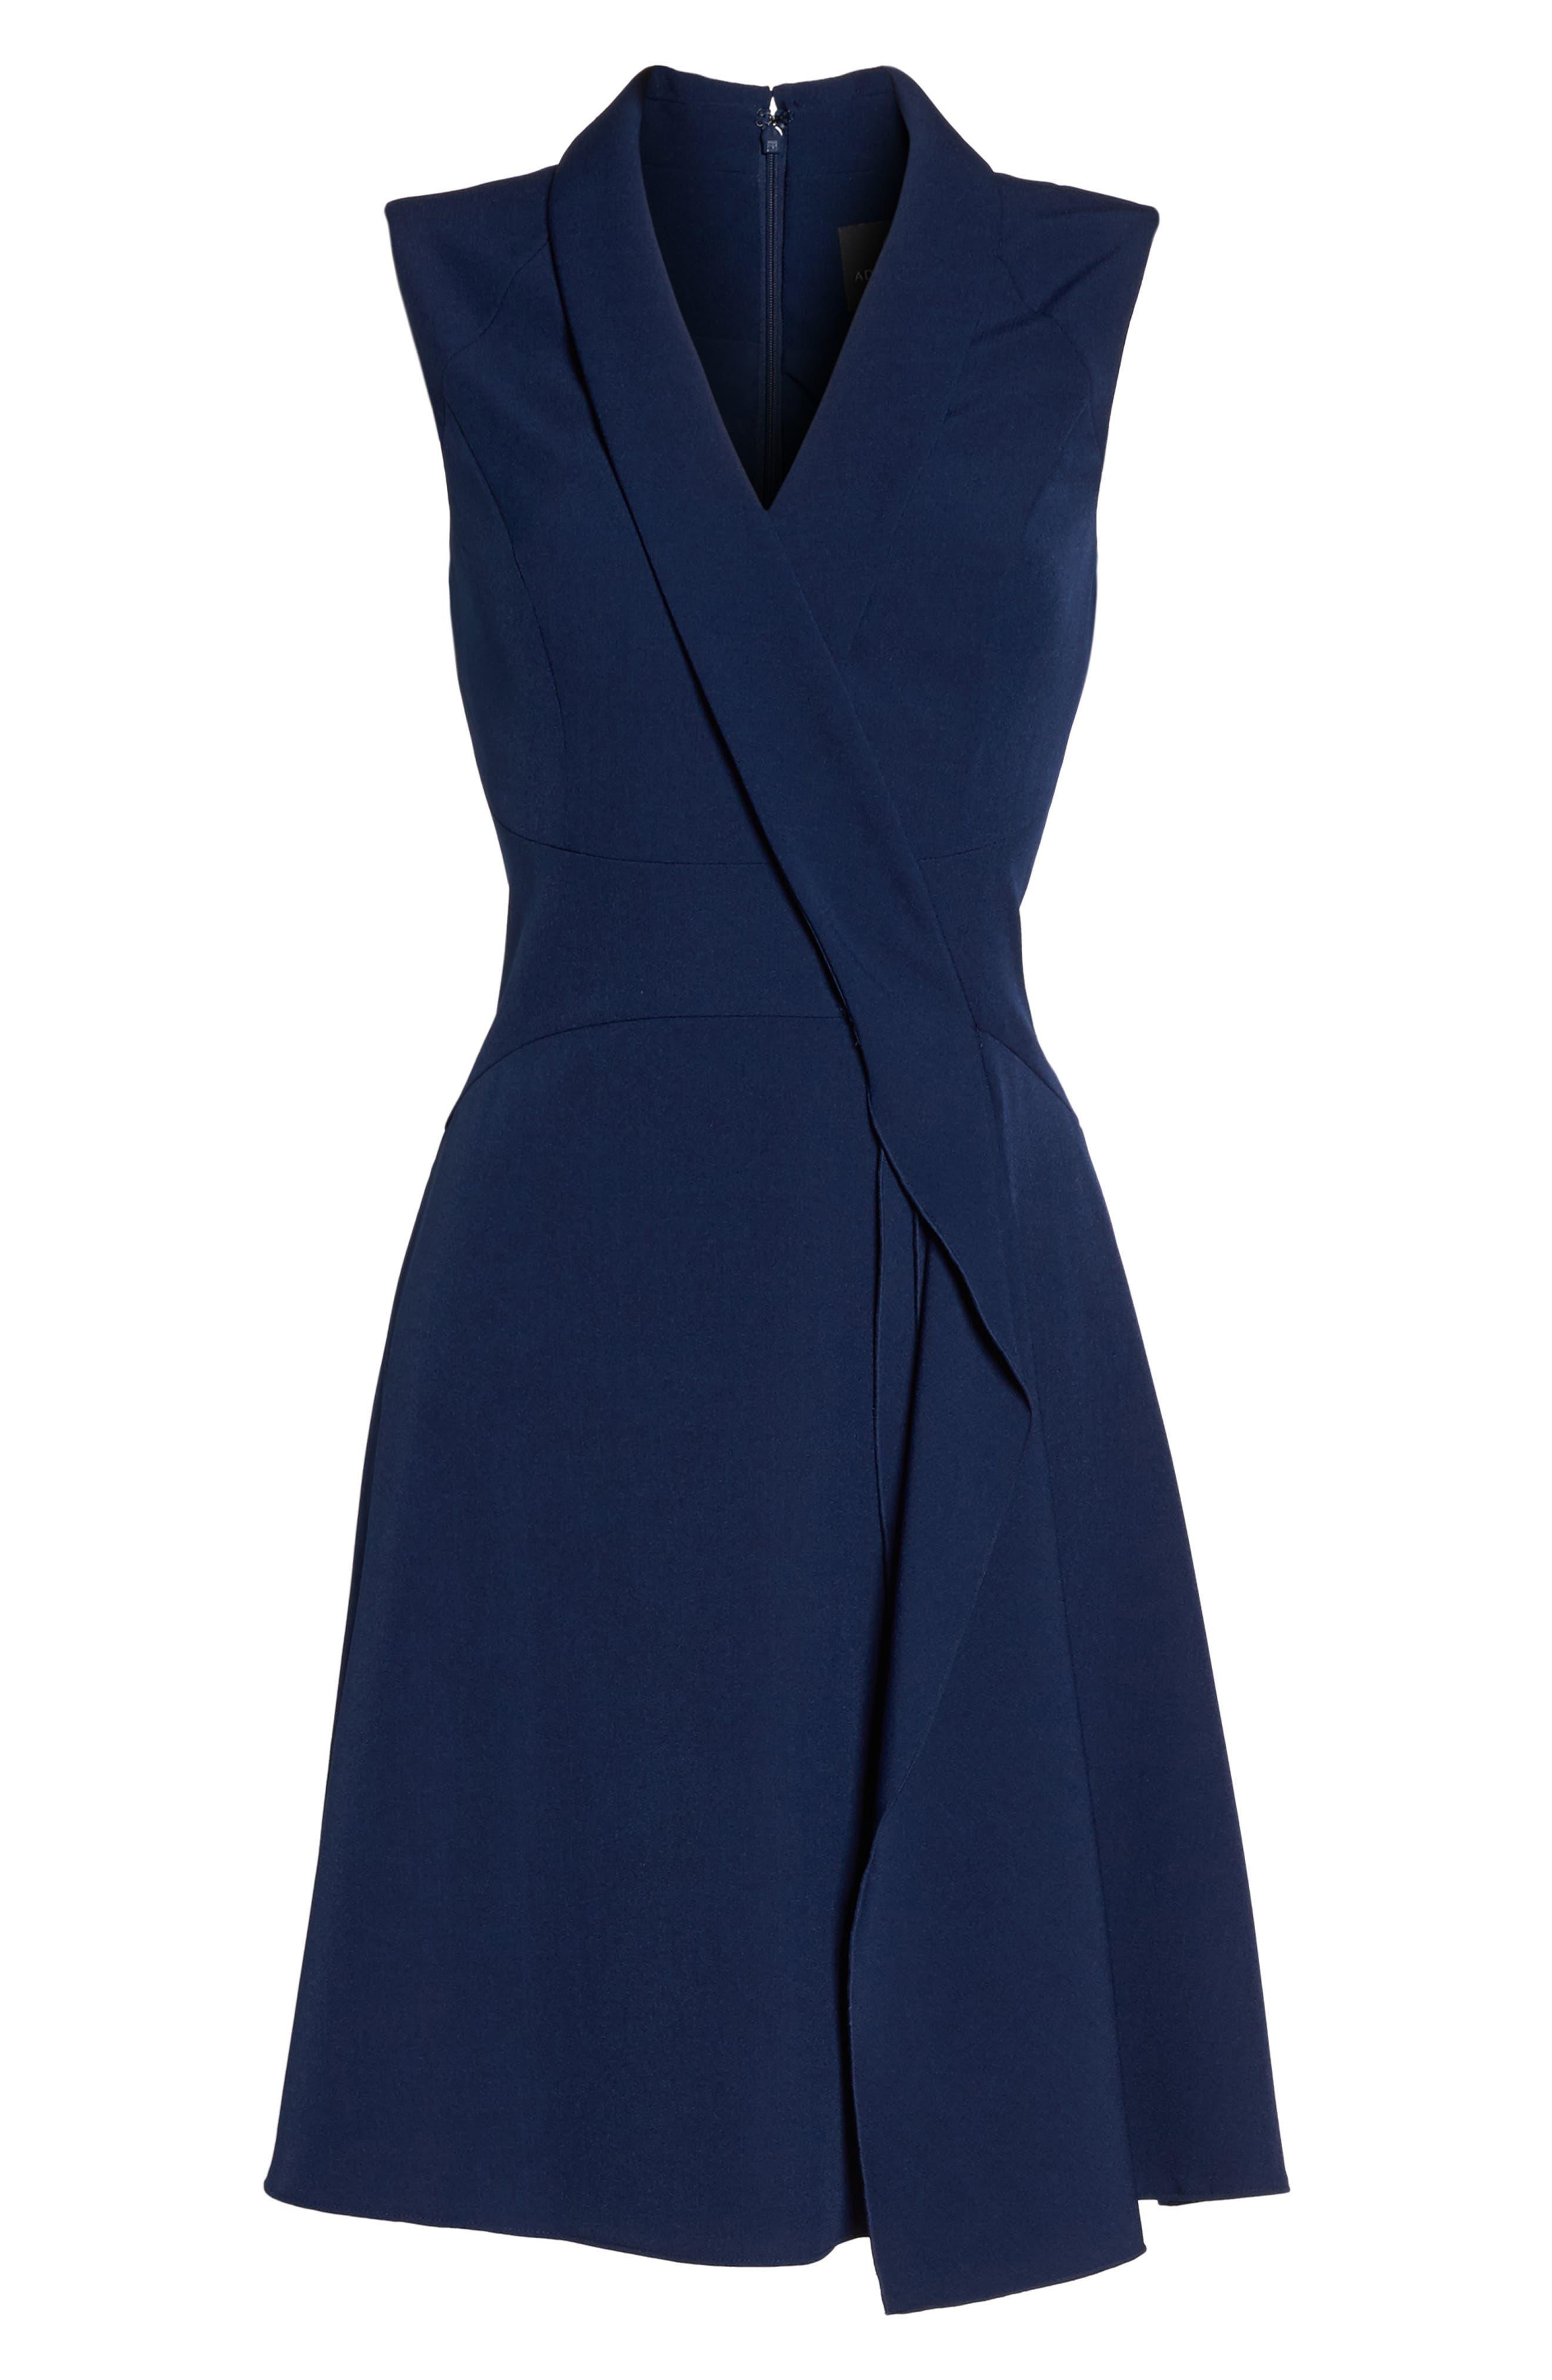 Stretch Crepe A-Line Dress,                             Alternate thumbnail 6, color,                             413